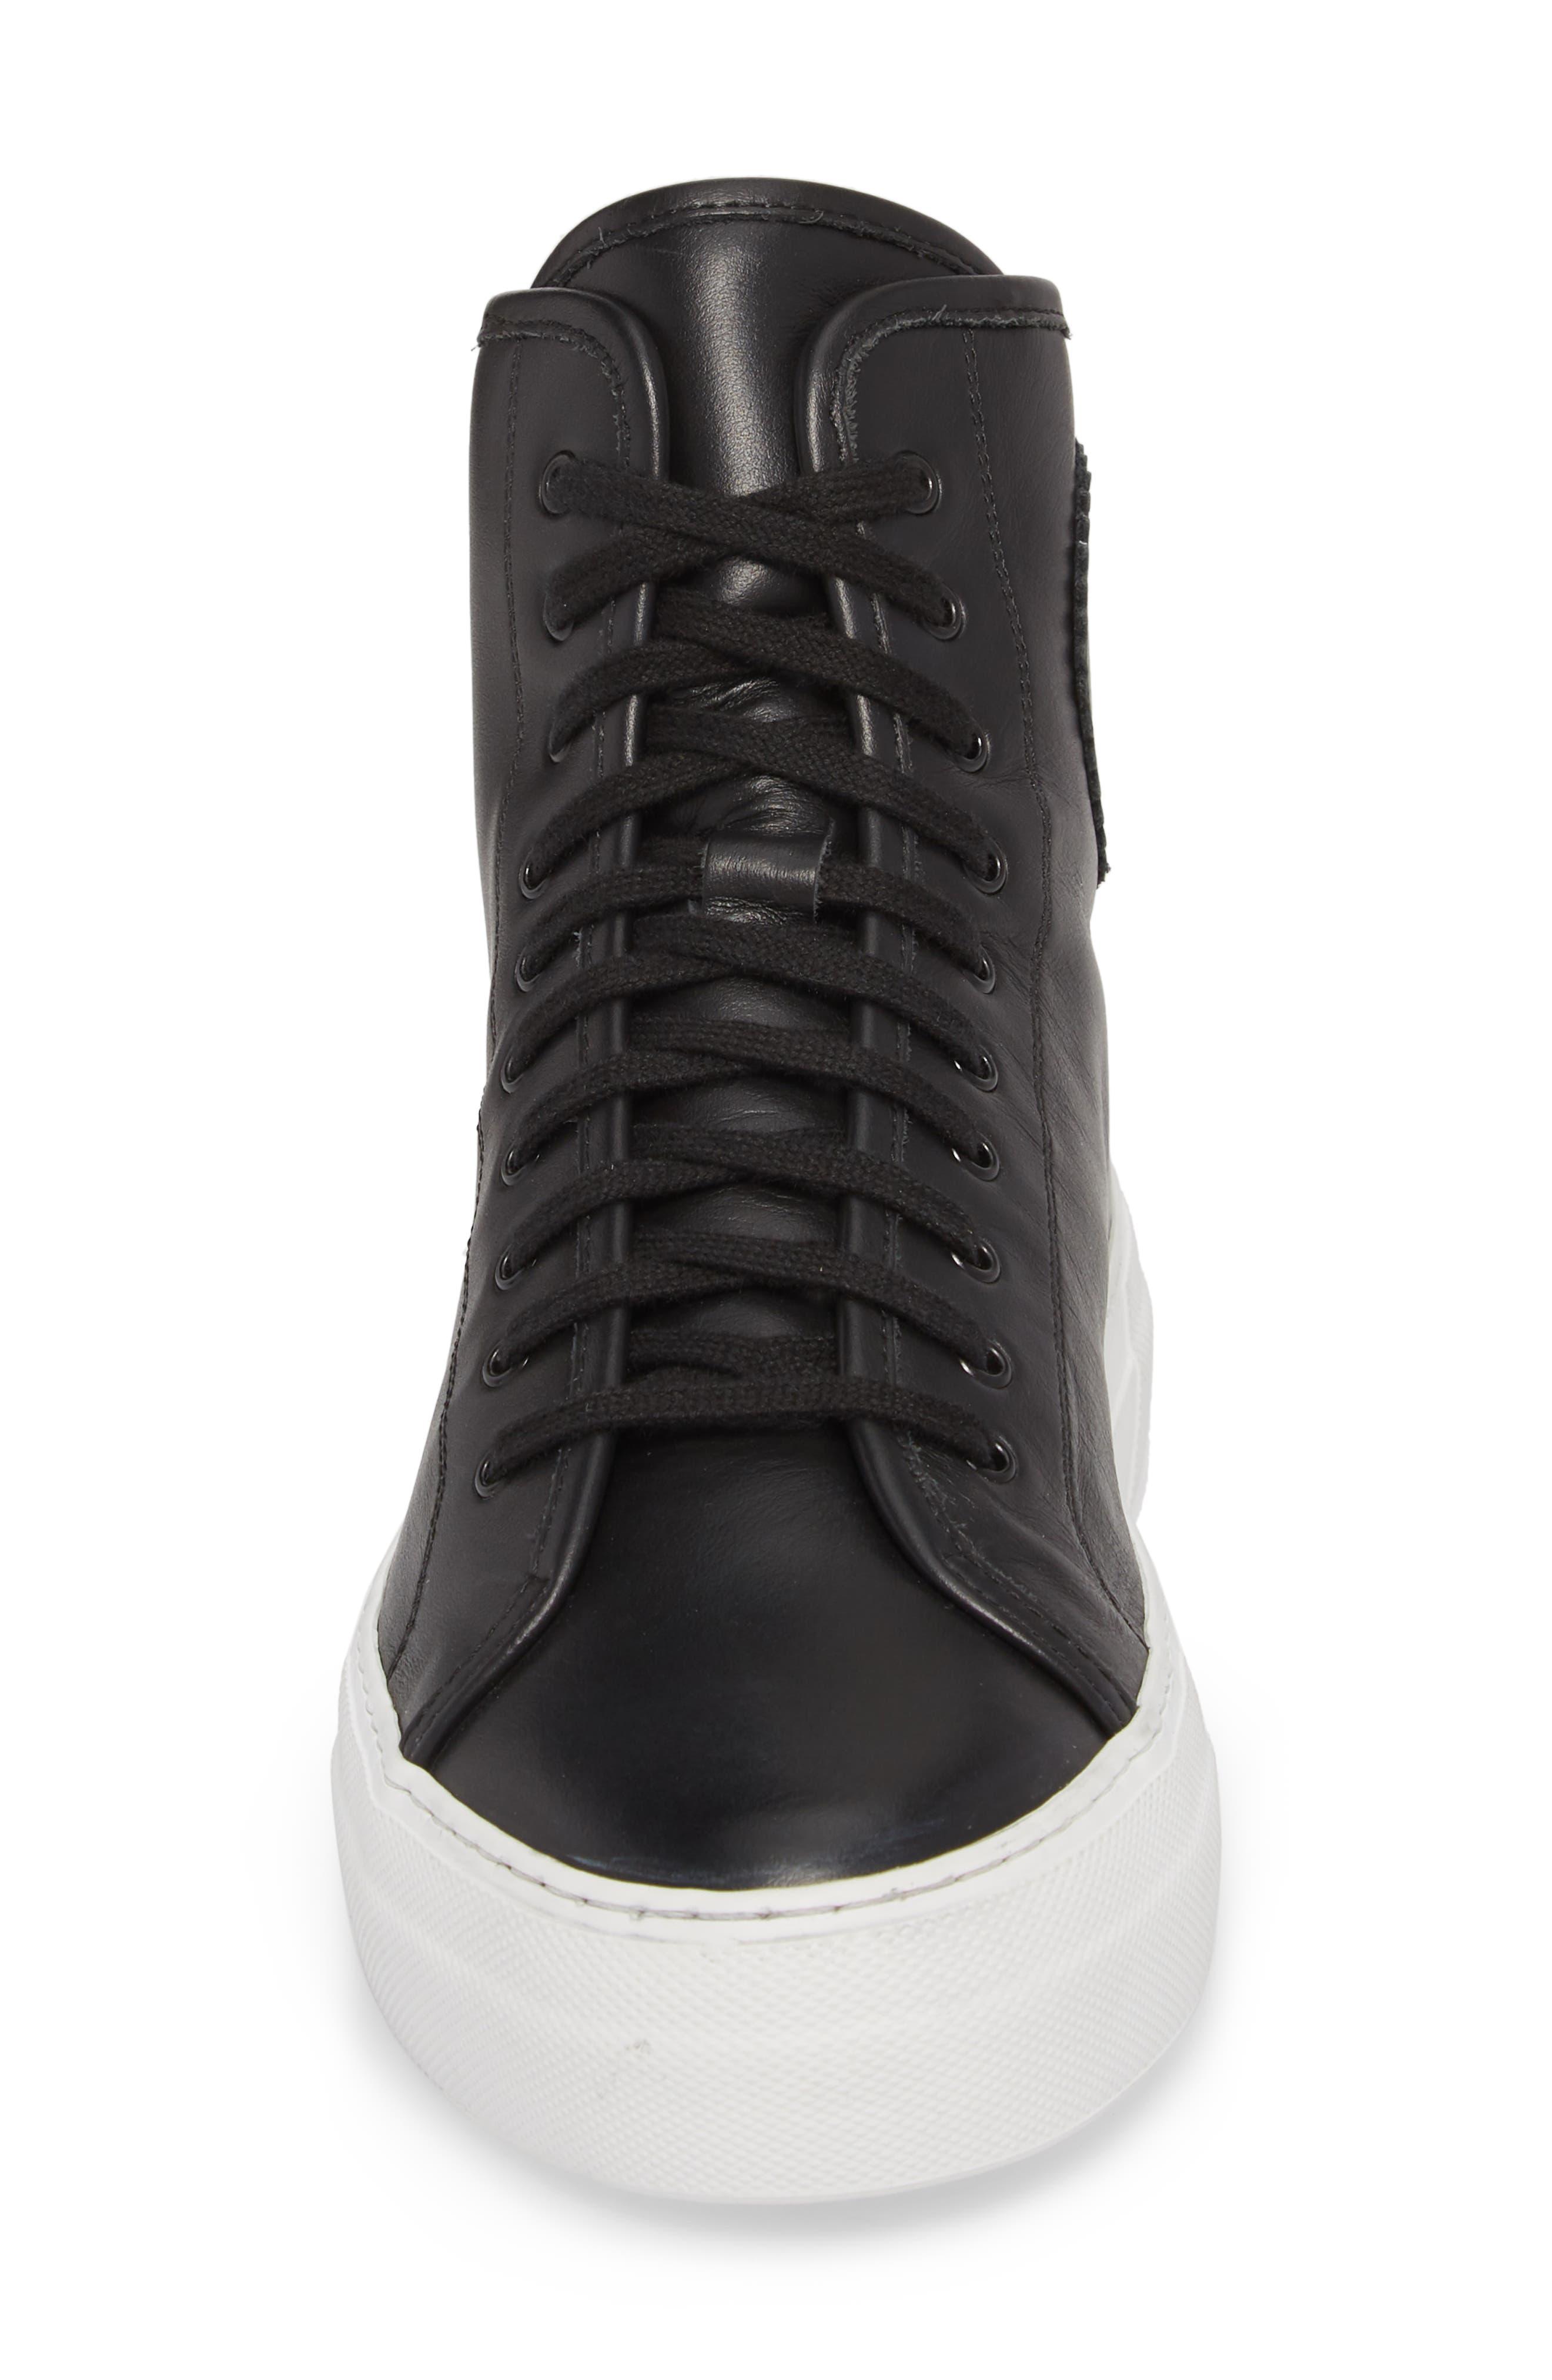 COMMON PROJECTS, Tournament High Super Sneaker, Alternate thumbnail 4, color, BLACK/ WHITE